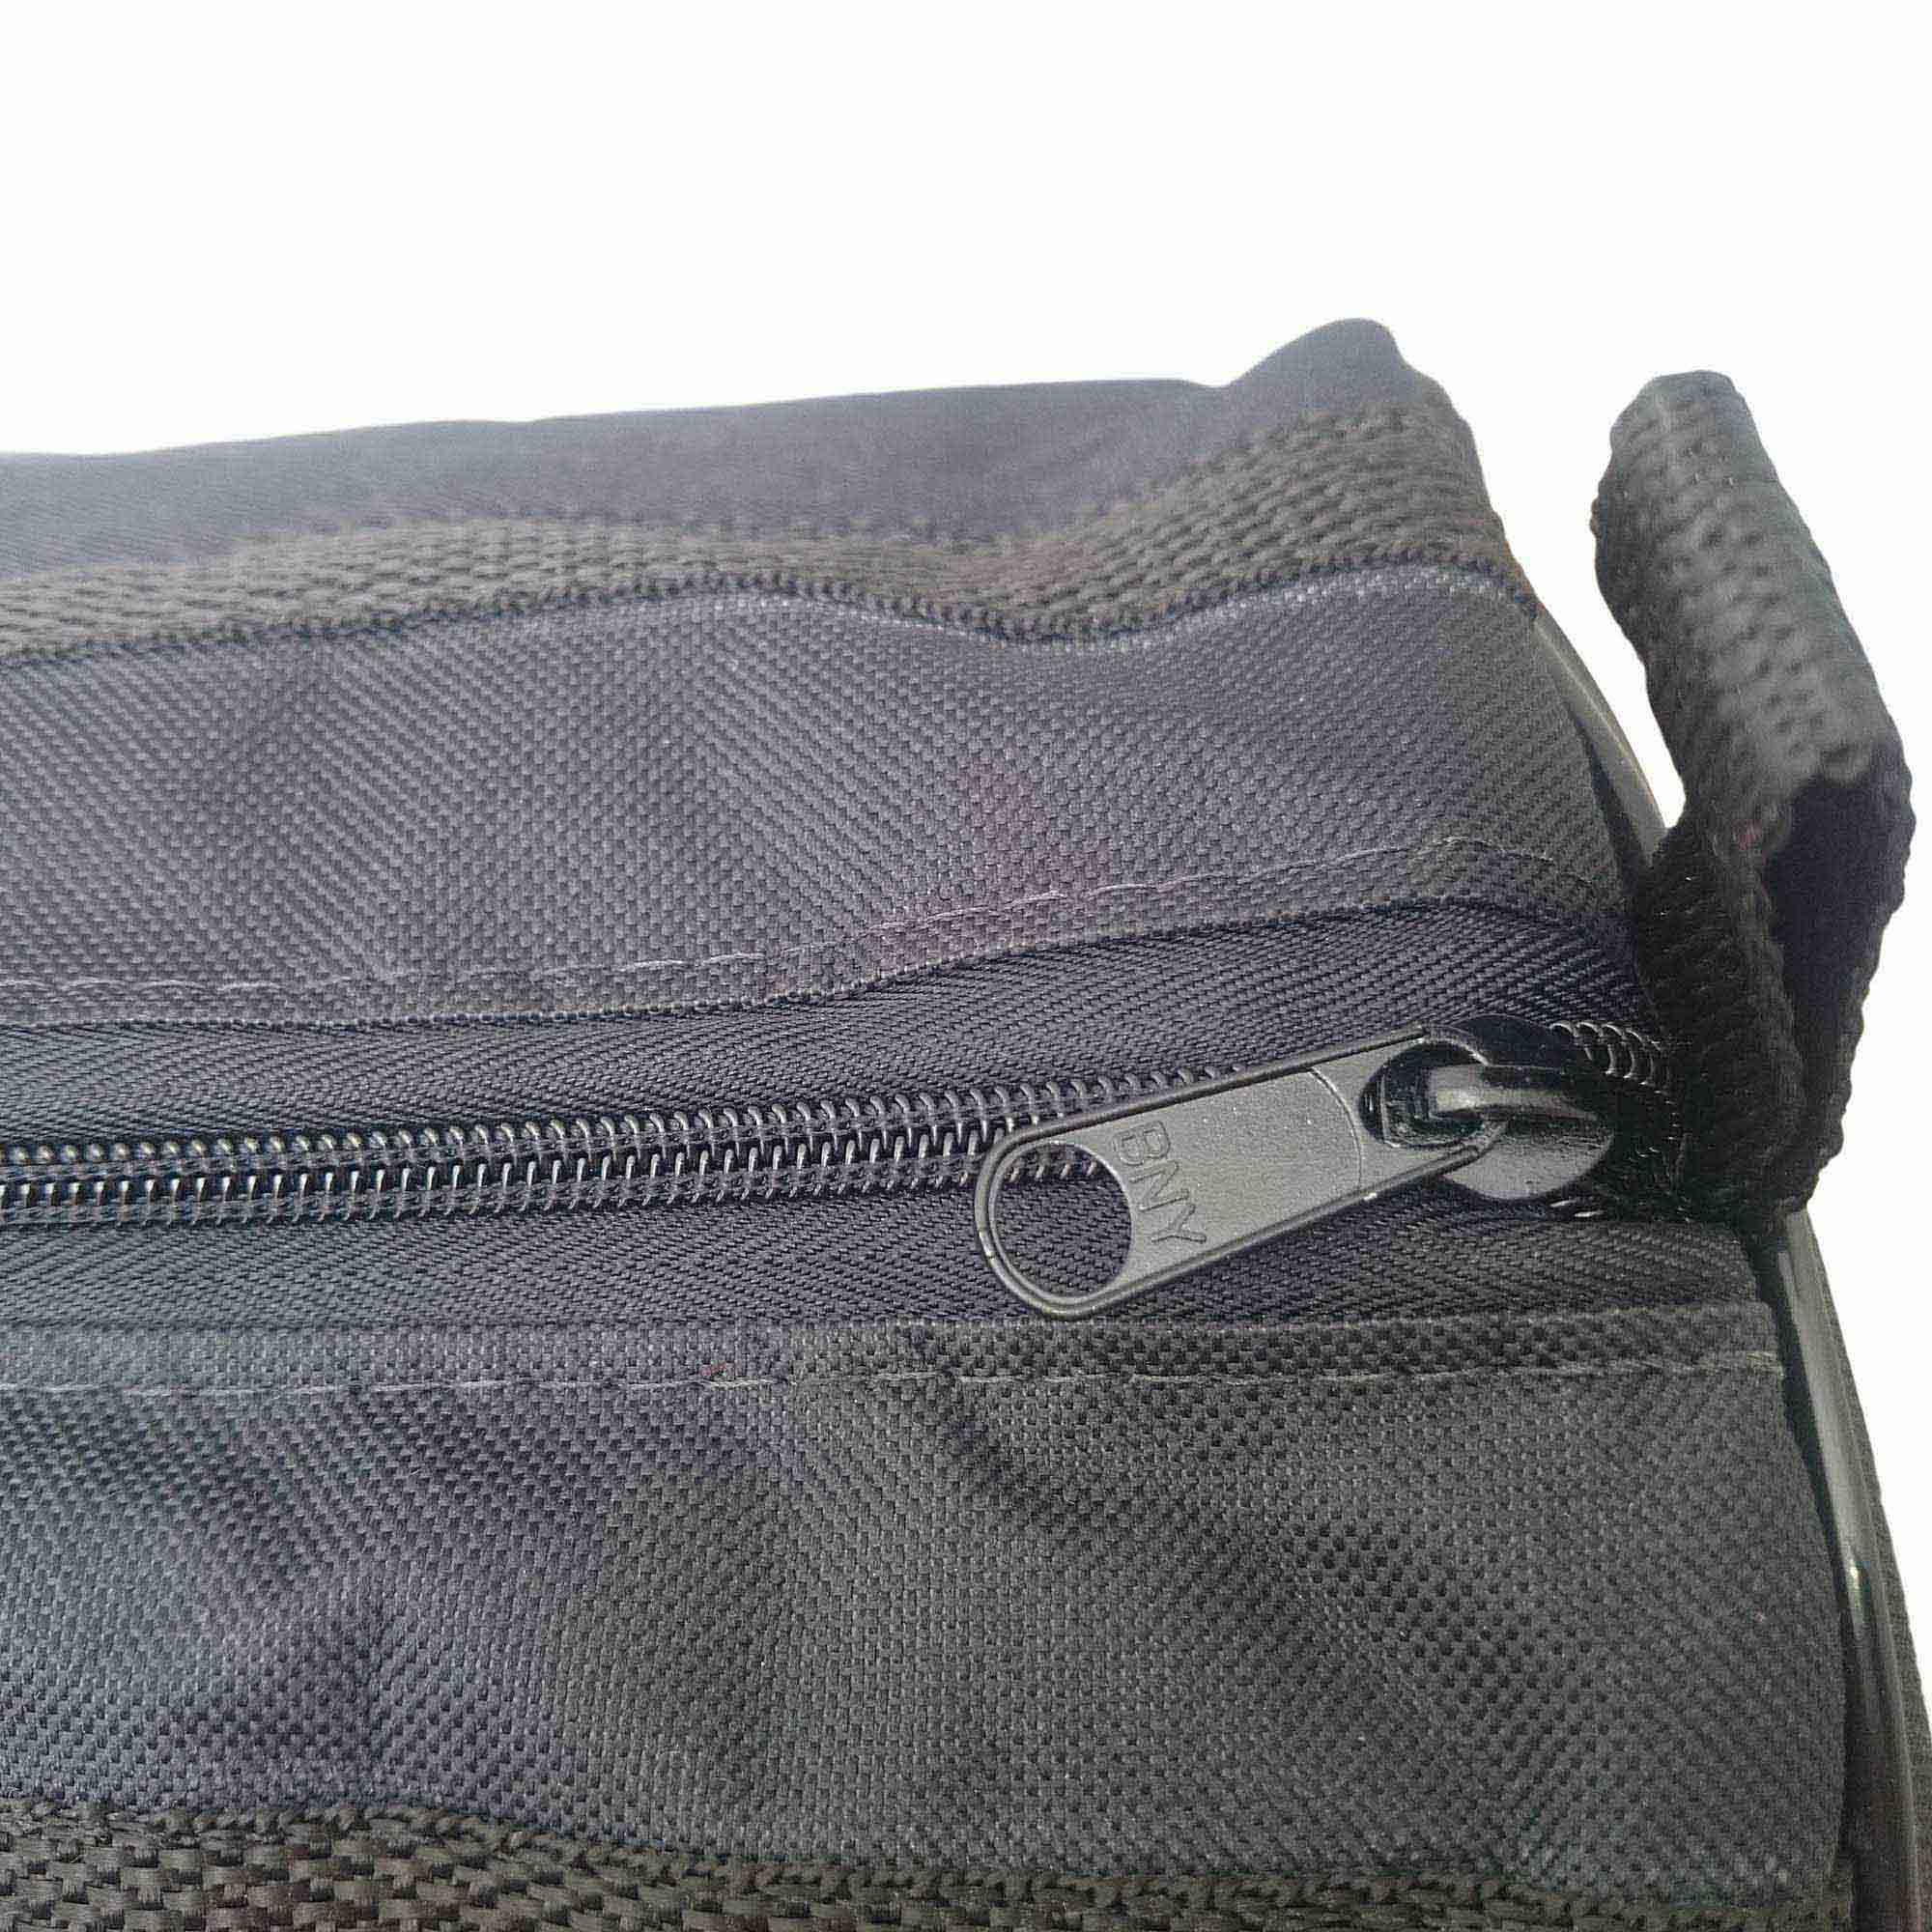 Capa Bag P/ Ferragens De Bateria Extra Luxo Acolchoada 102 x 25 cm